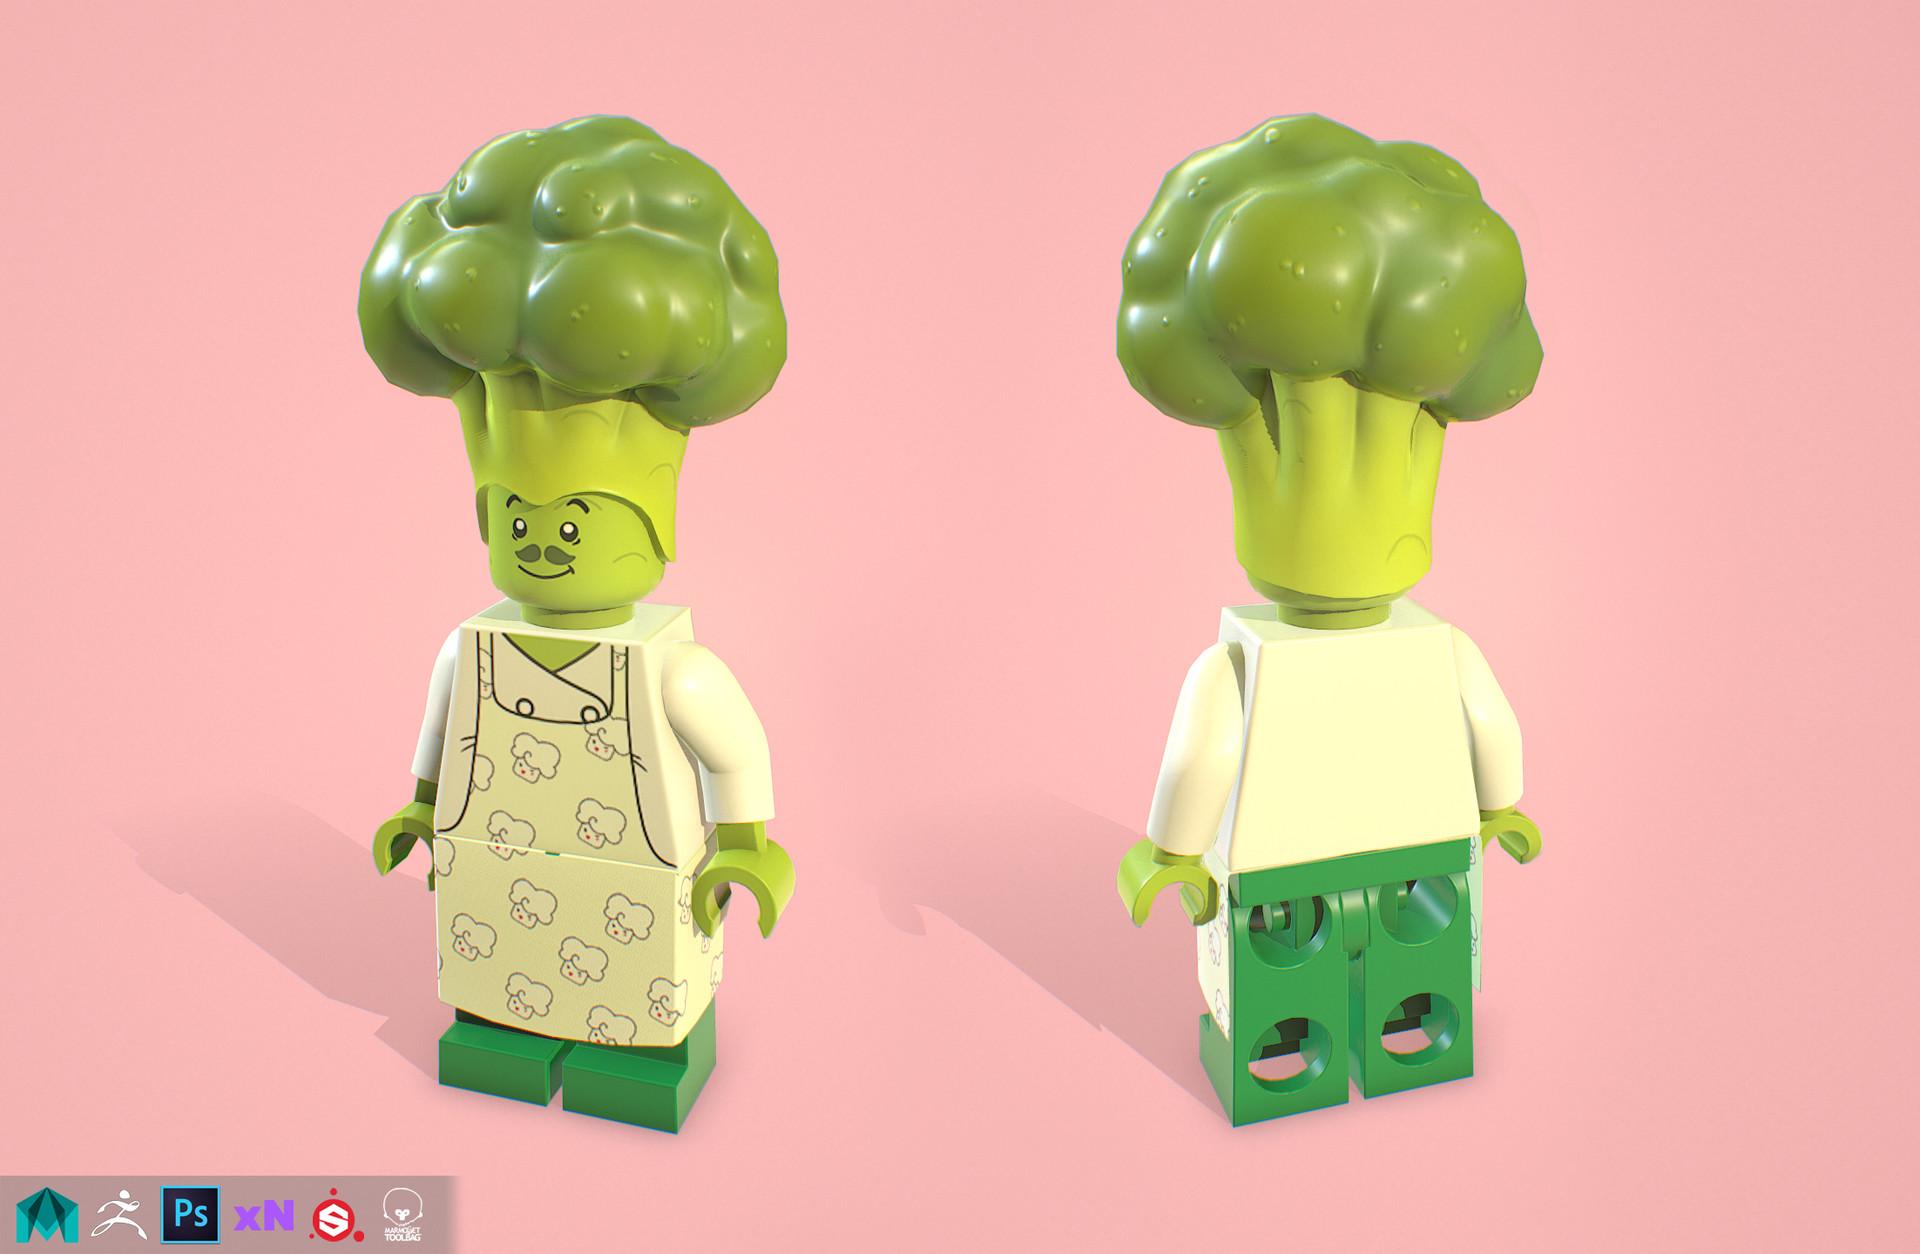 Dulce isis segarra lopez 02 broccolego basepose02color